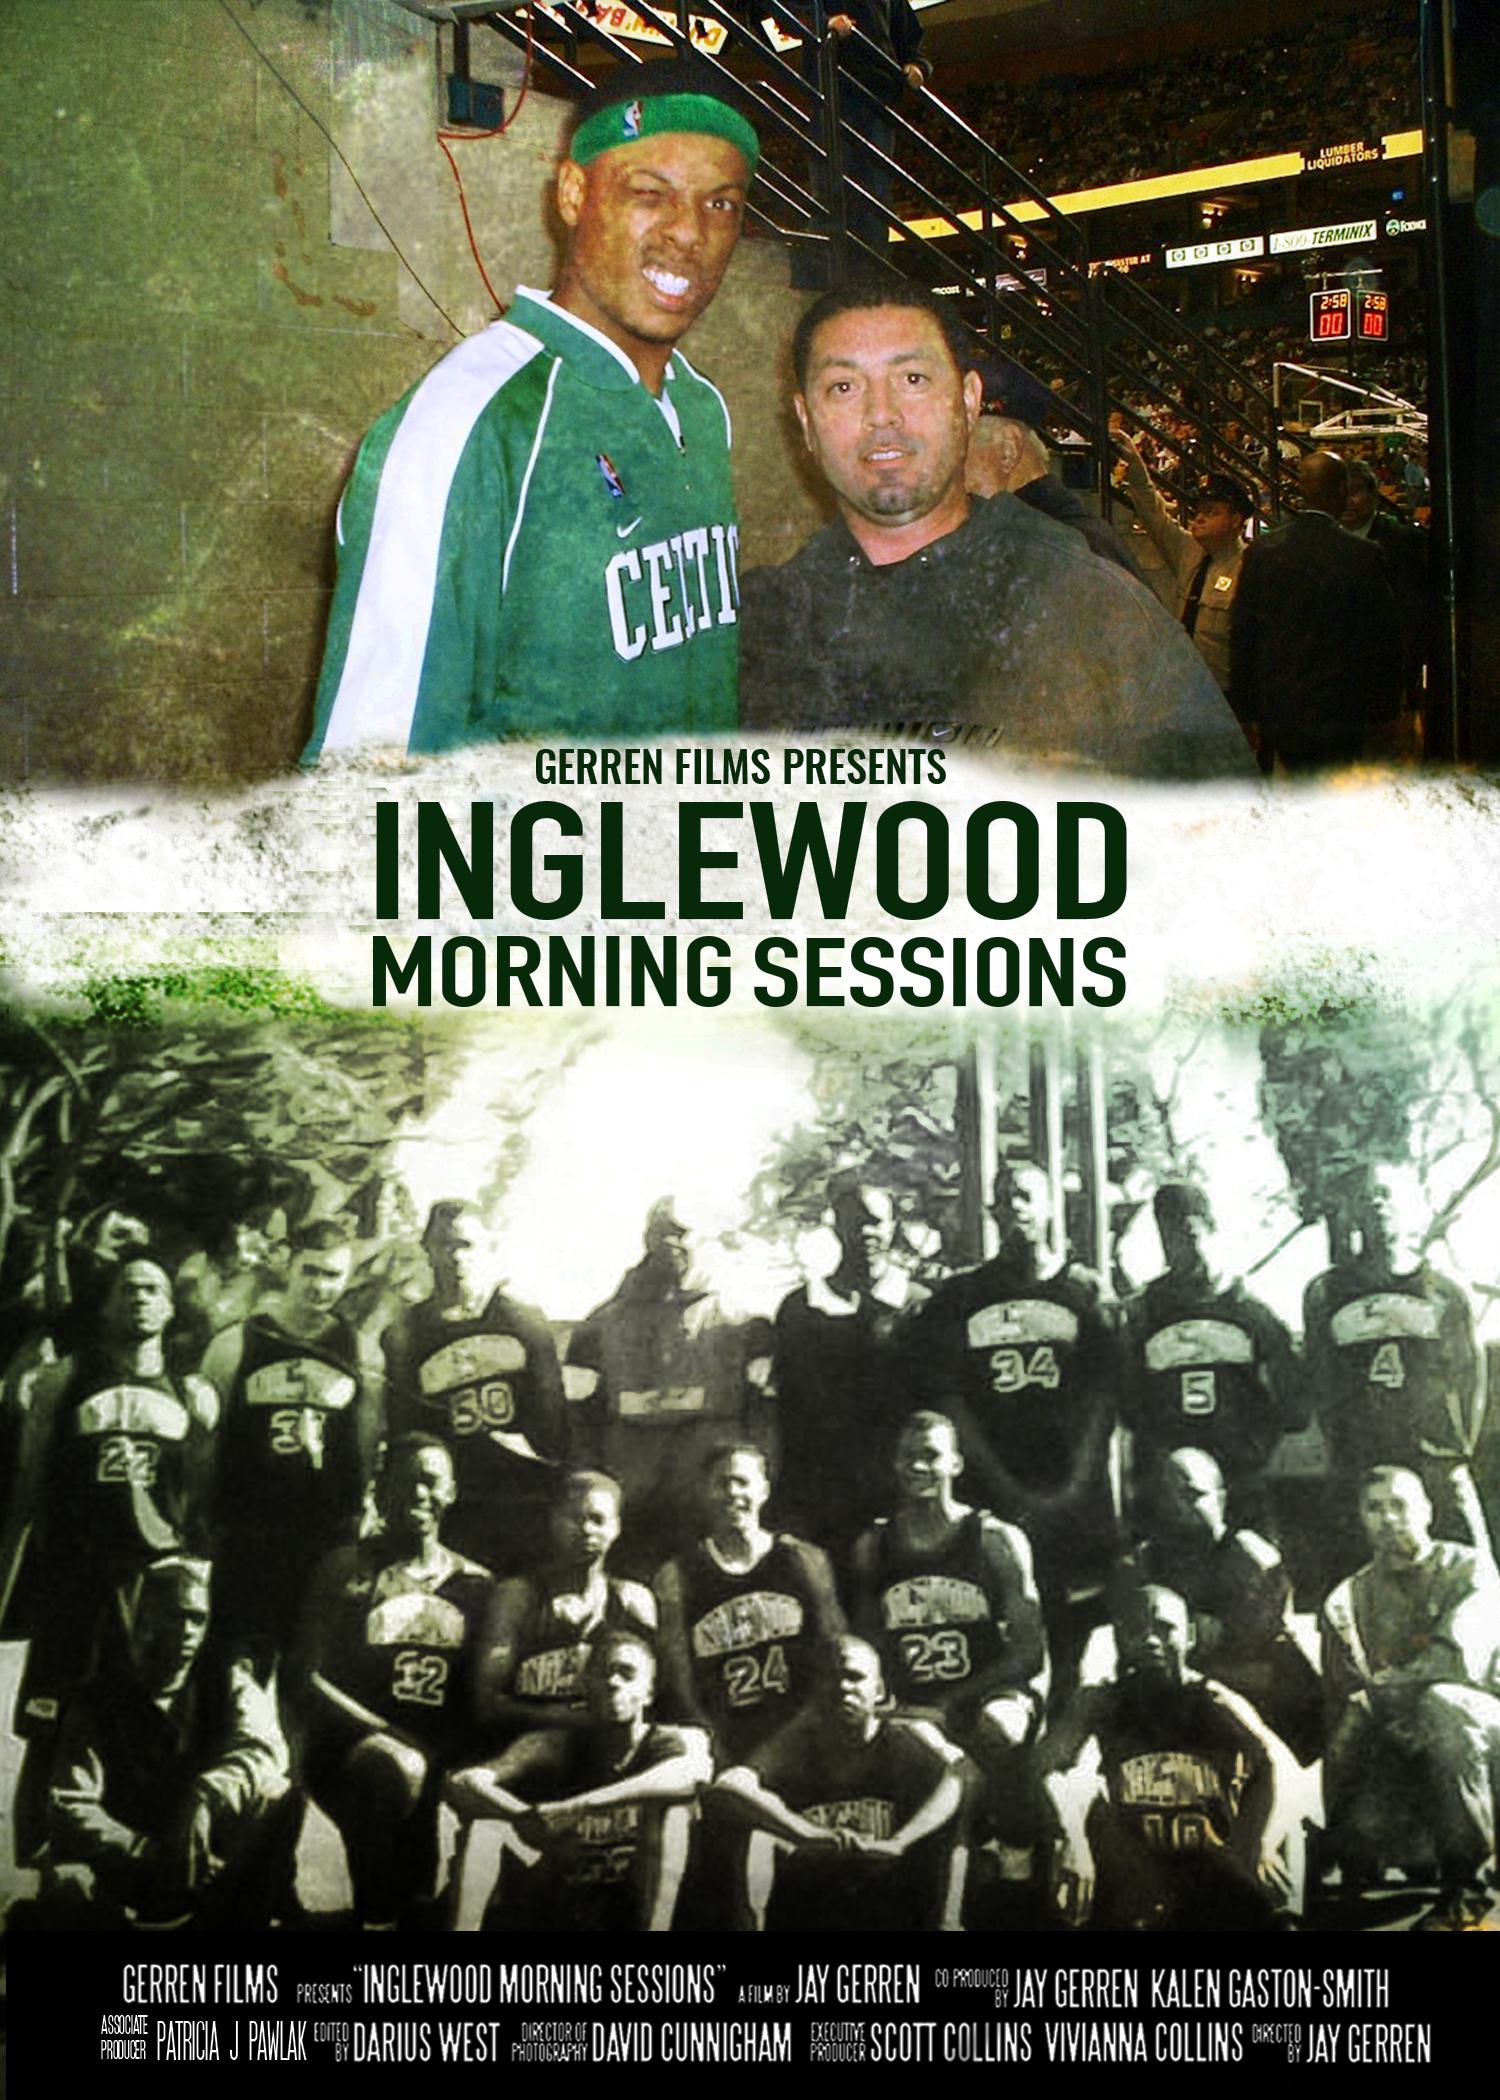 Inglewood Morning Sessions - IMDb